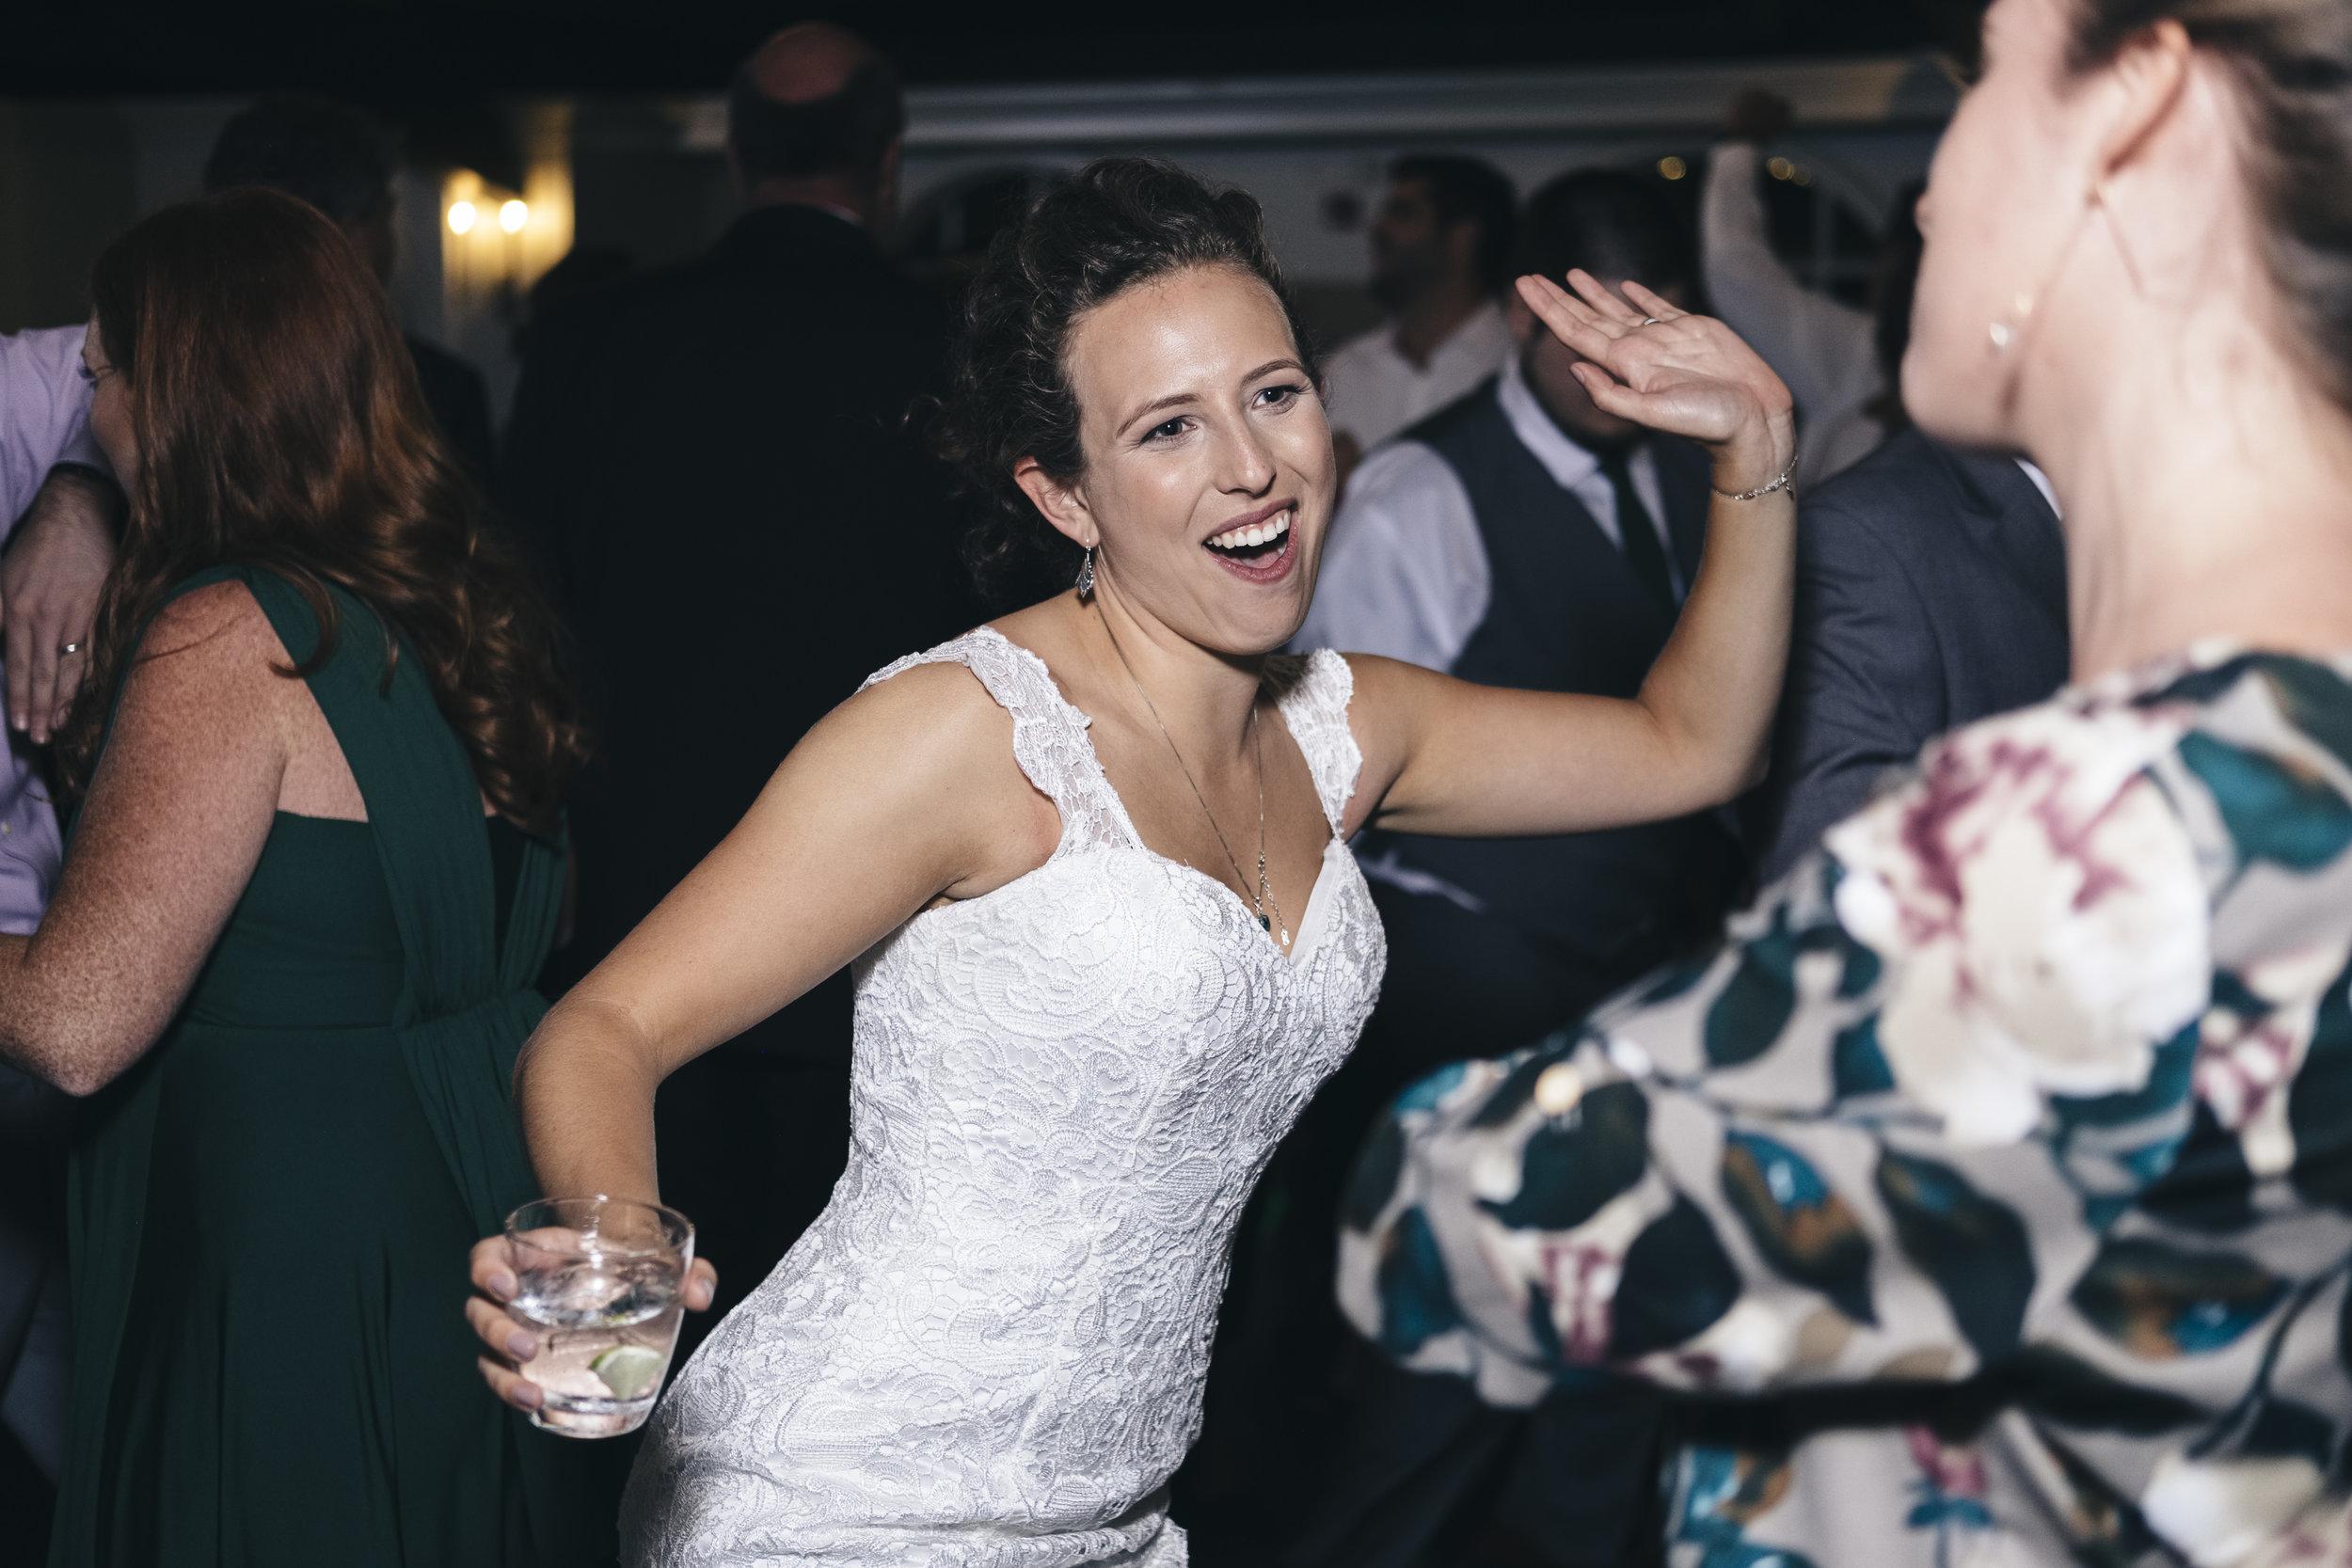 Bride in Toledo Ohio Dances at Her Wedding with Photographers